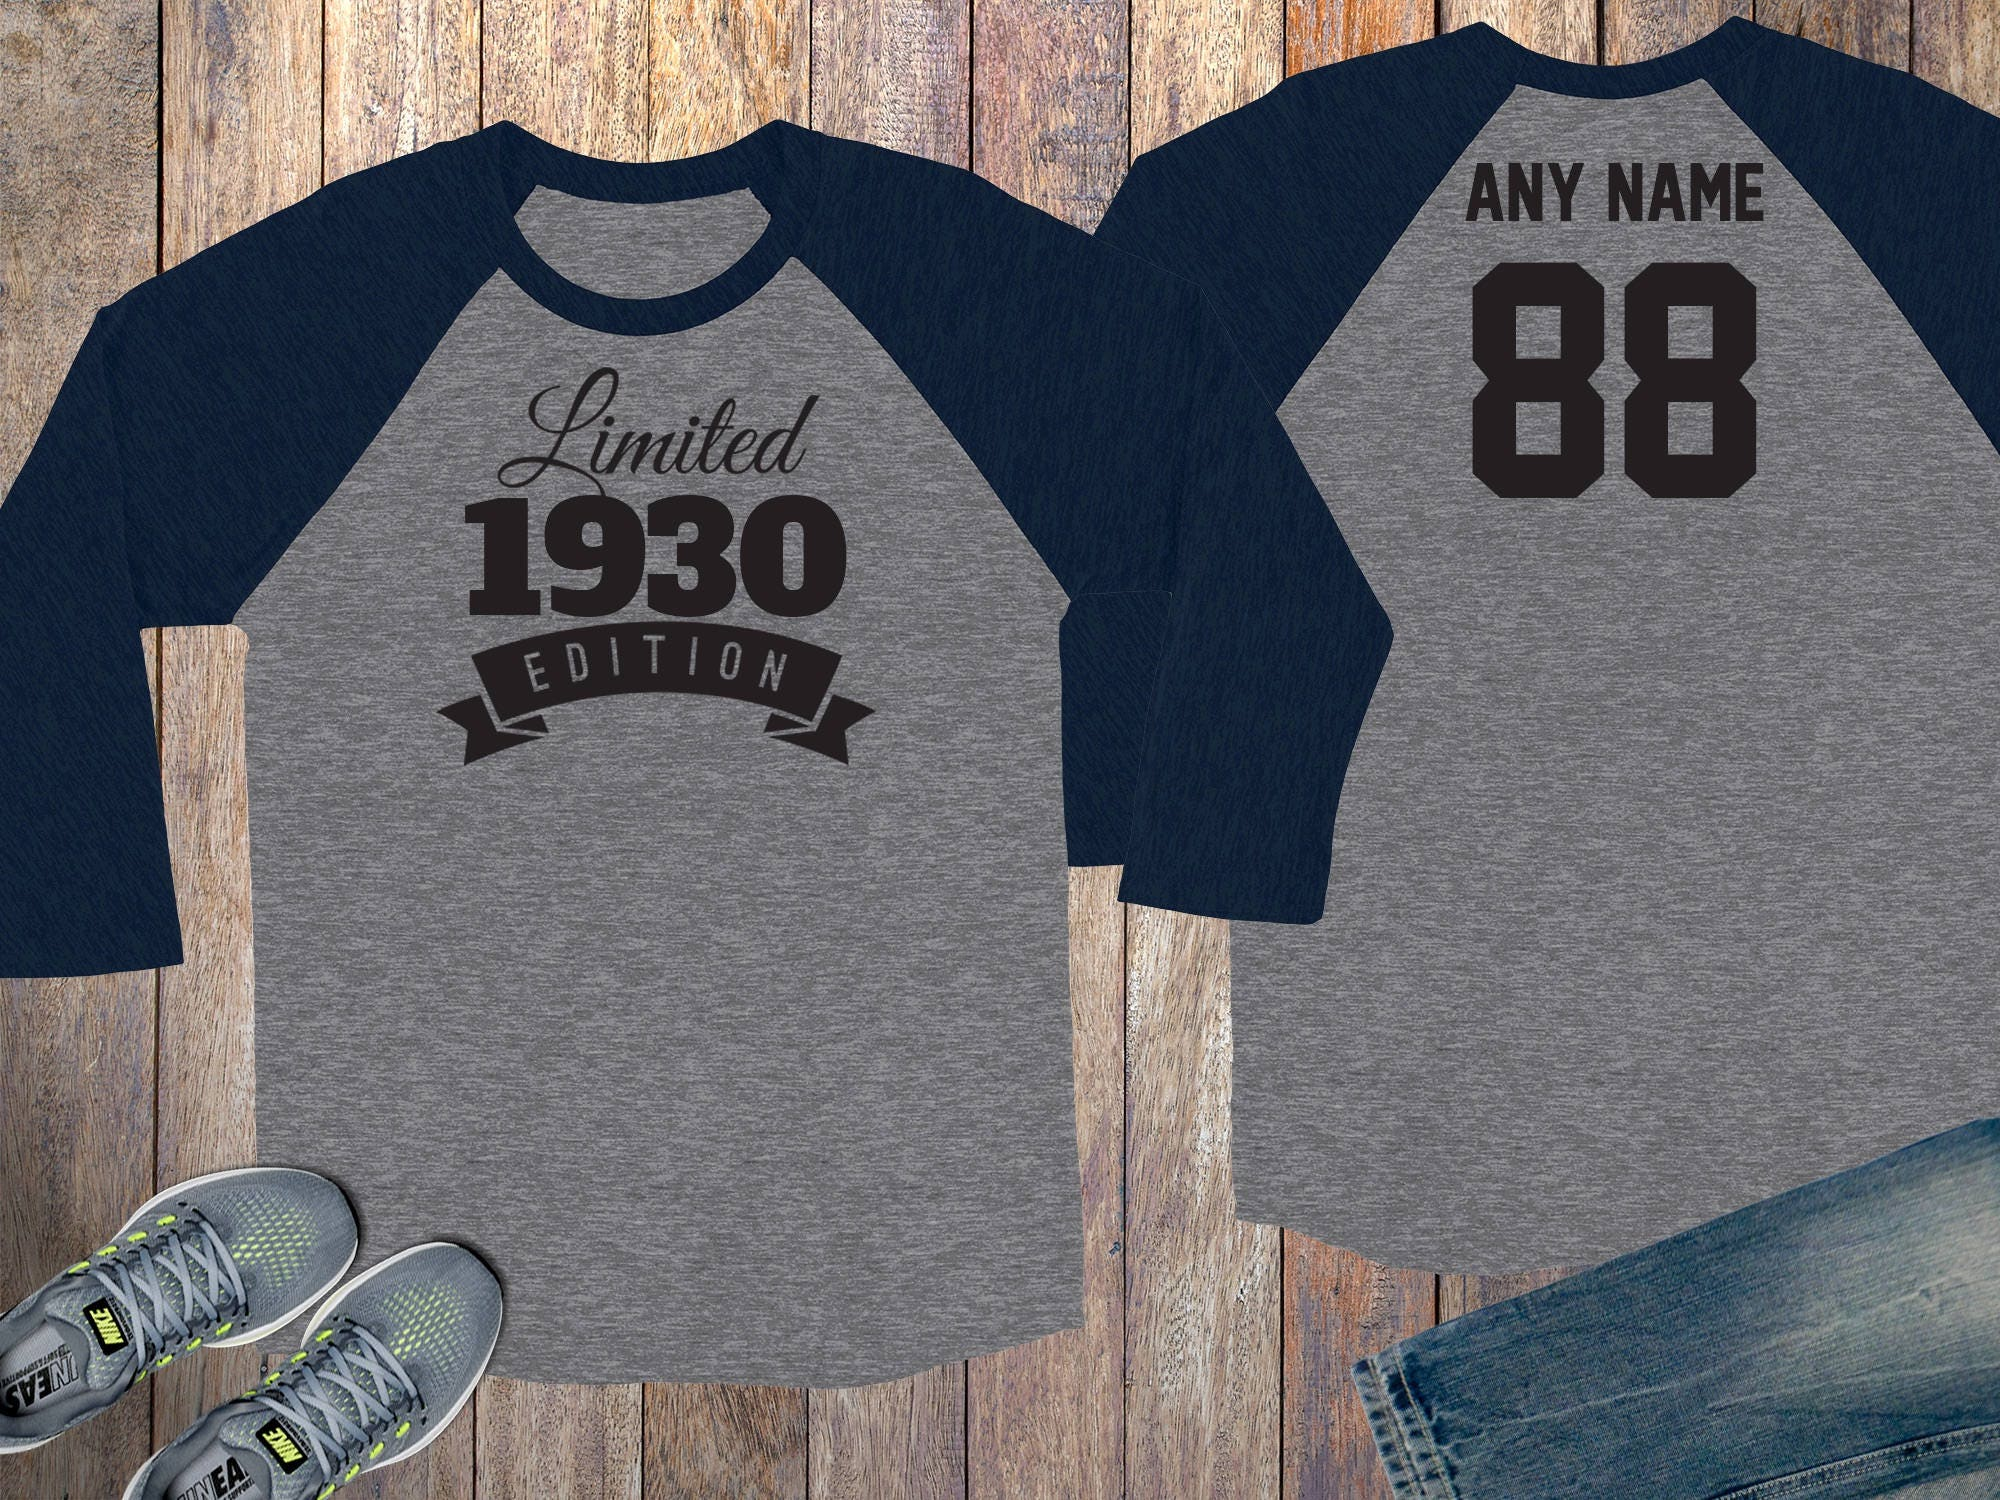 88th Birthday Gift For Men And Women Idea Limited Edition Celebration 88 Year Old Raglan Baseball Tee Shirt 1930